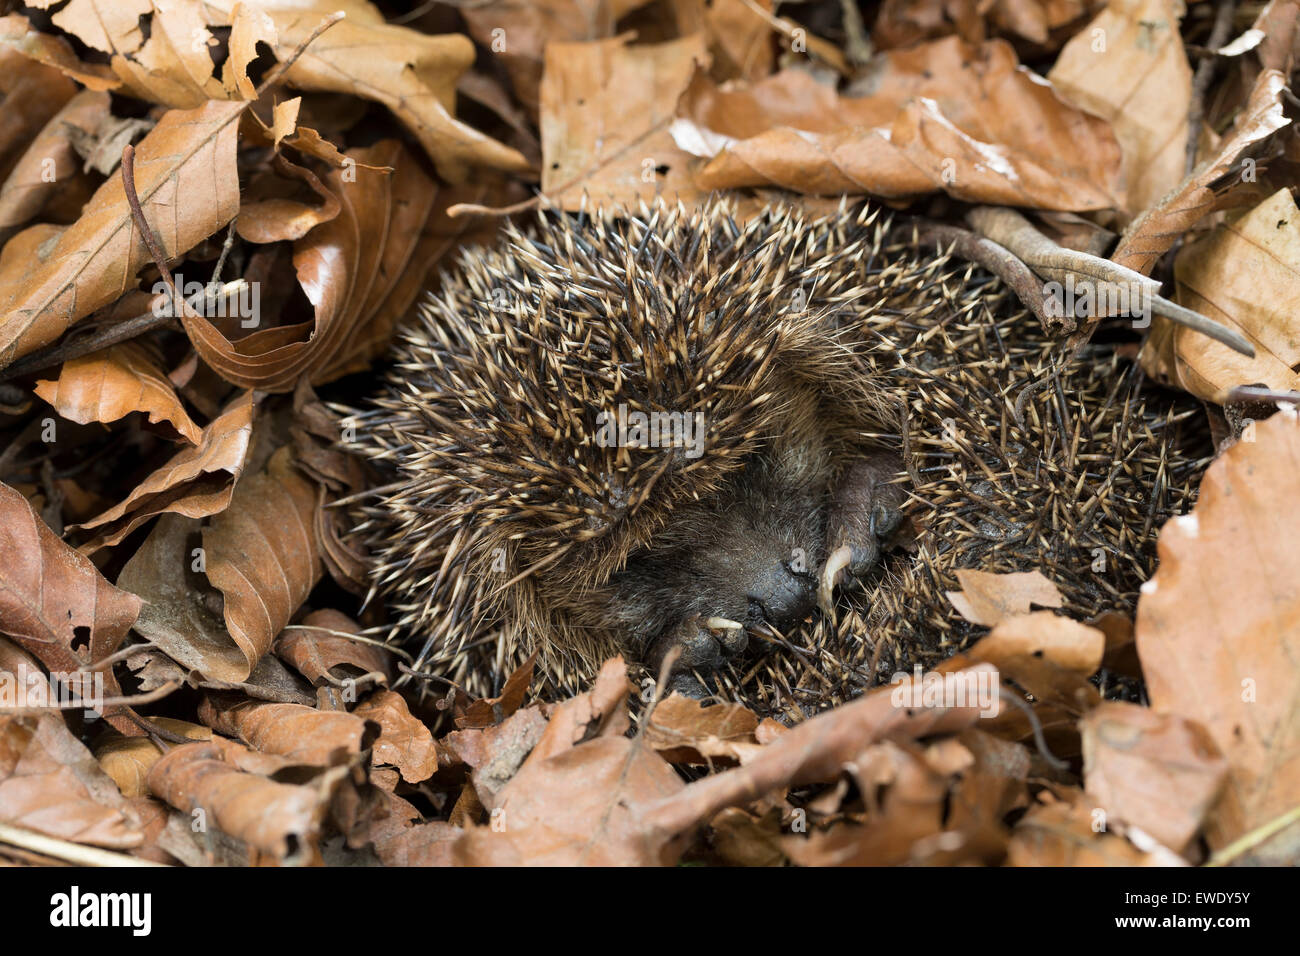 European Hedgehog Hibernation Overwinter Survival Europaischer